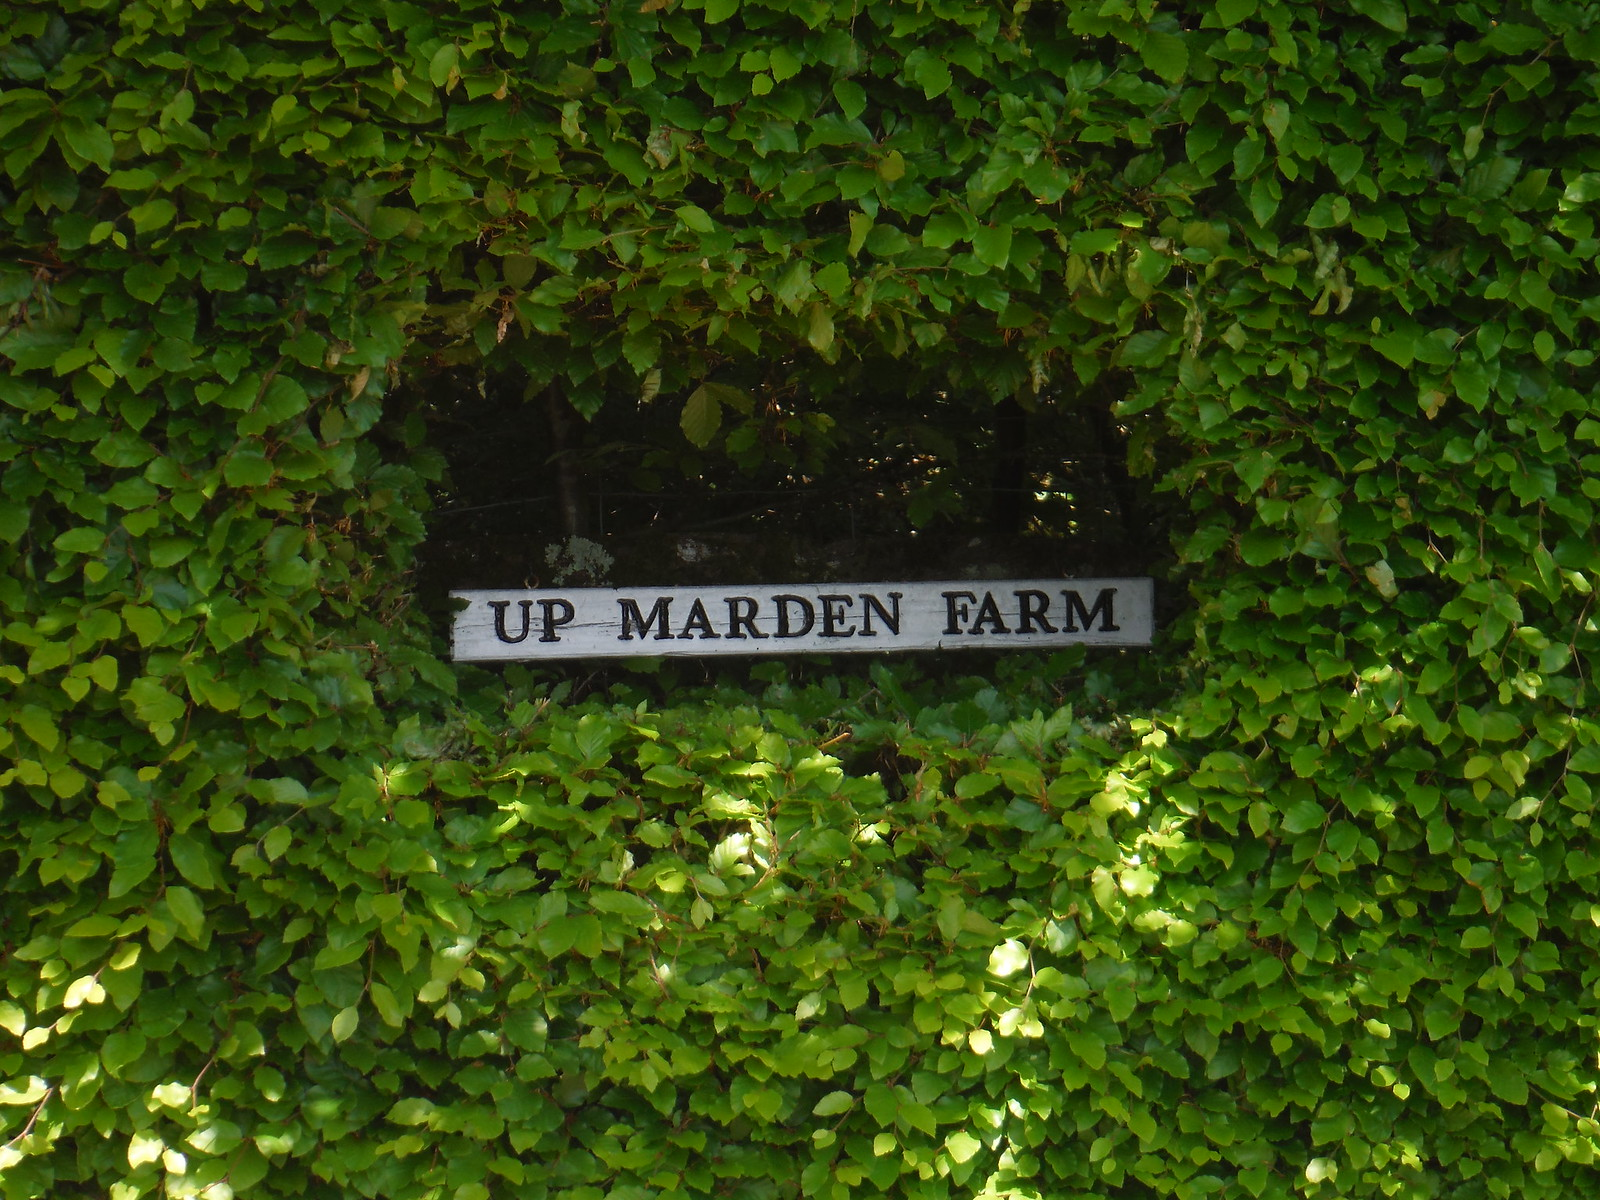 Farm Sign in Hedge SWC Walk Rowlands Castle Circular